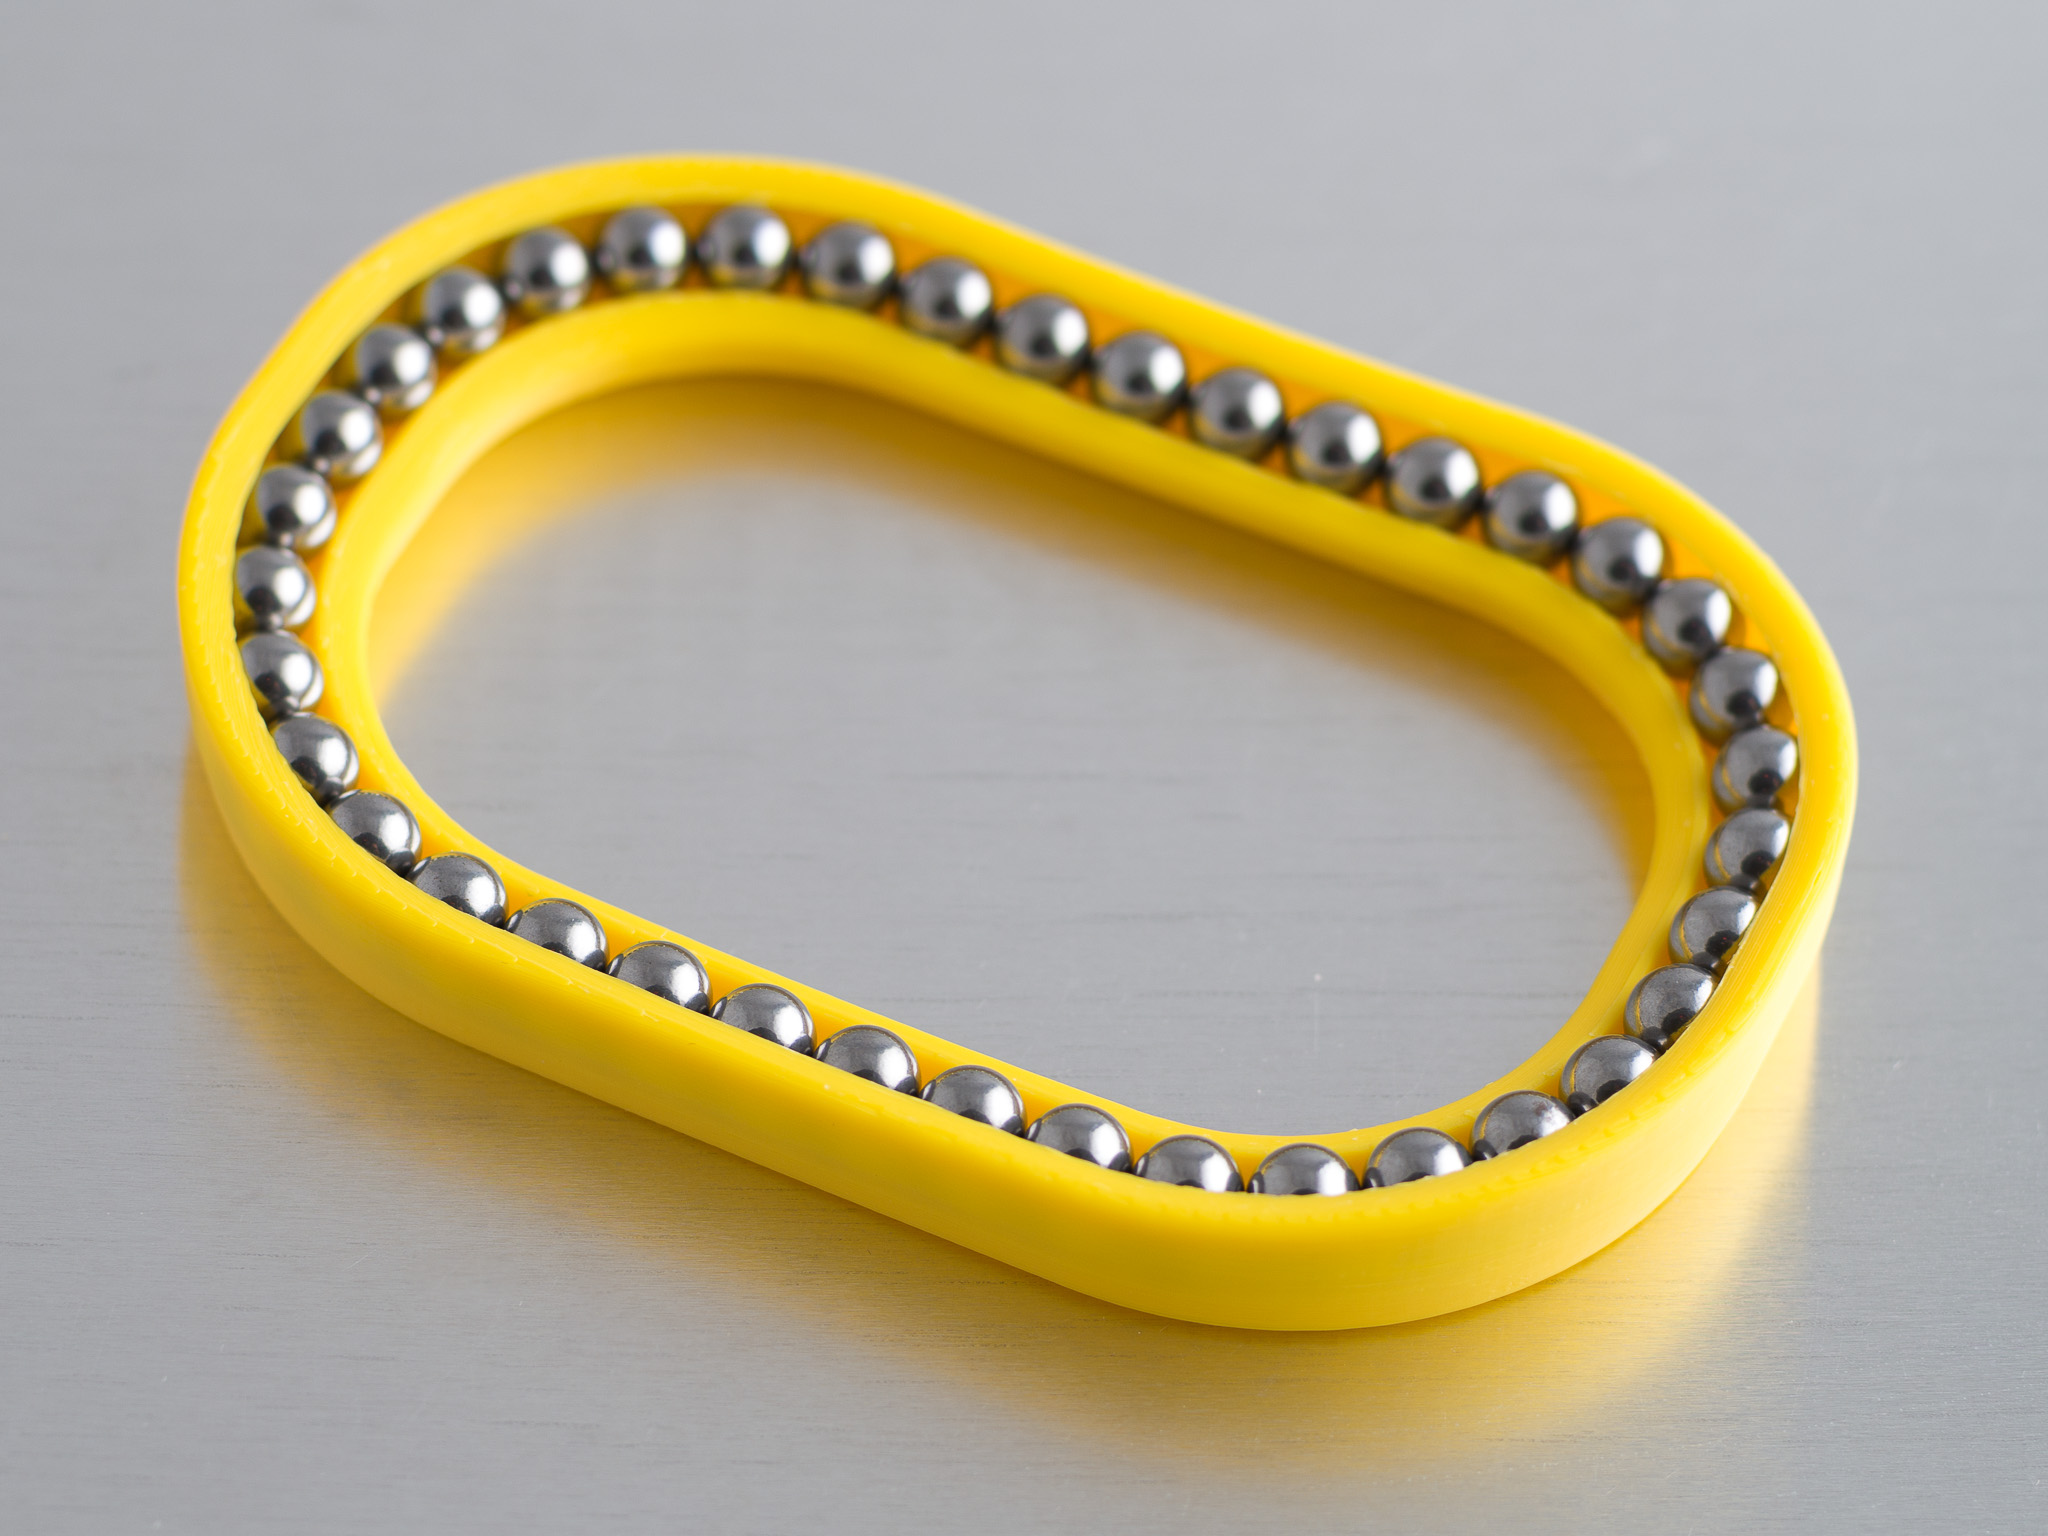 IMGP6670.jpg Download free STL file Filament Spool Holder • 3D printer template, WalterHsiao